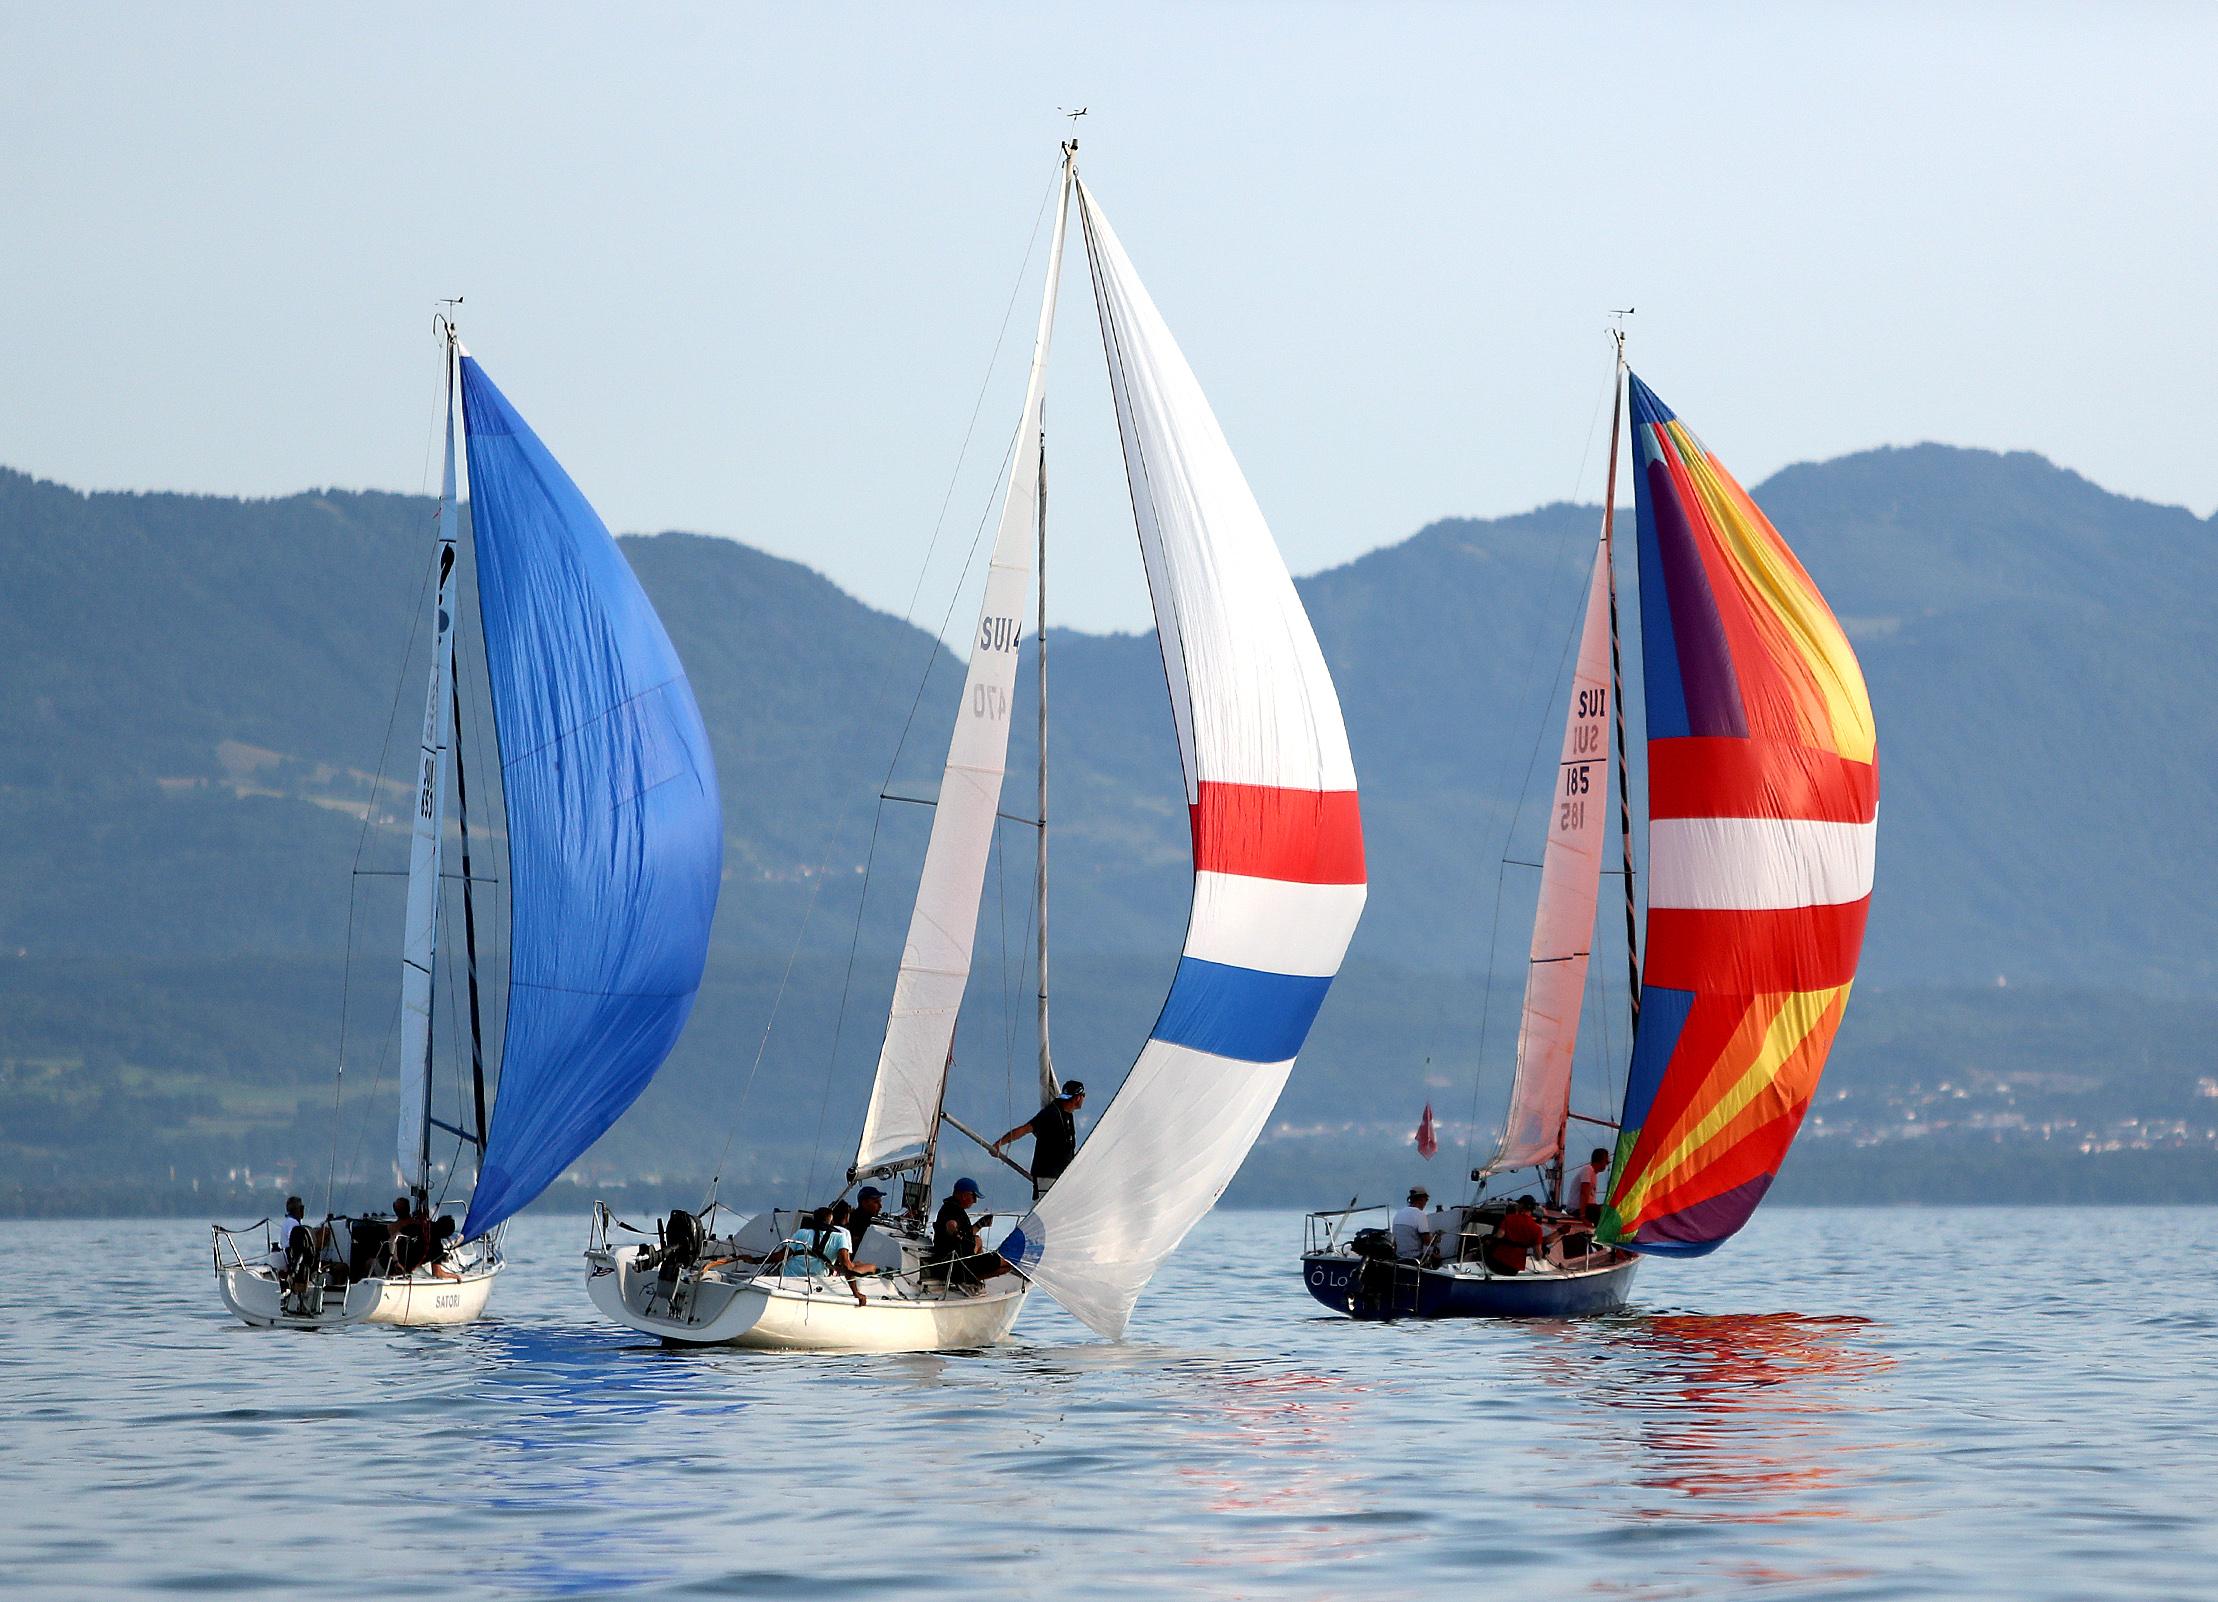 Un week-end festif au Club nautique